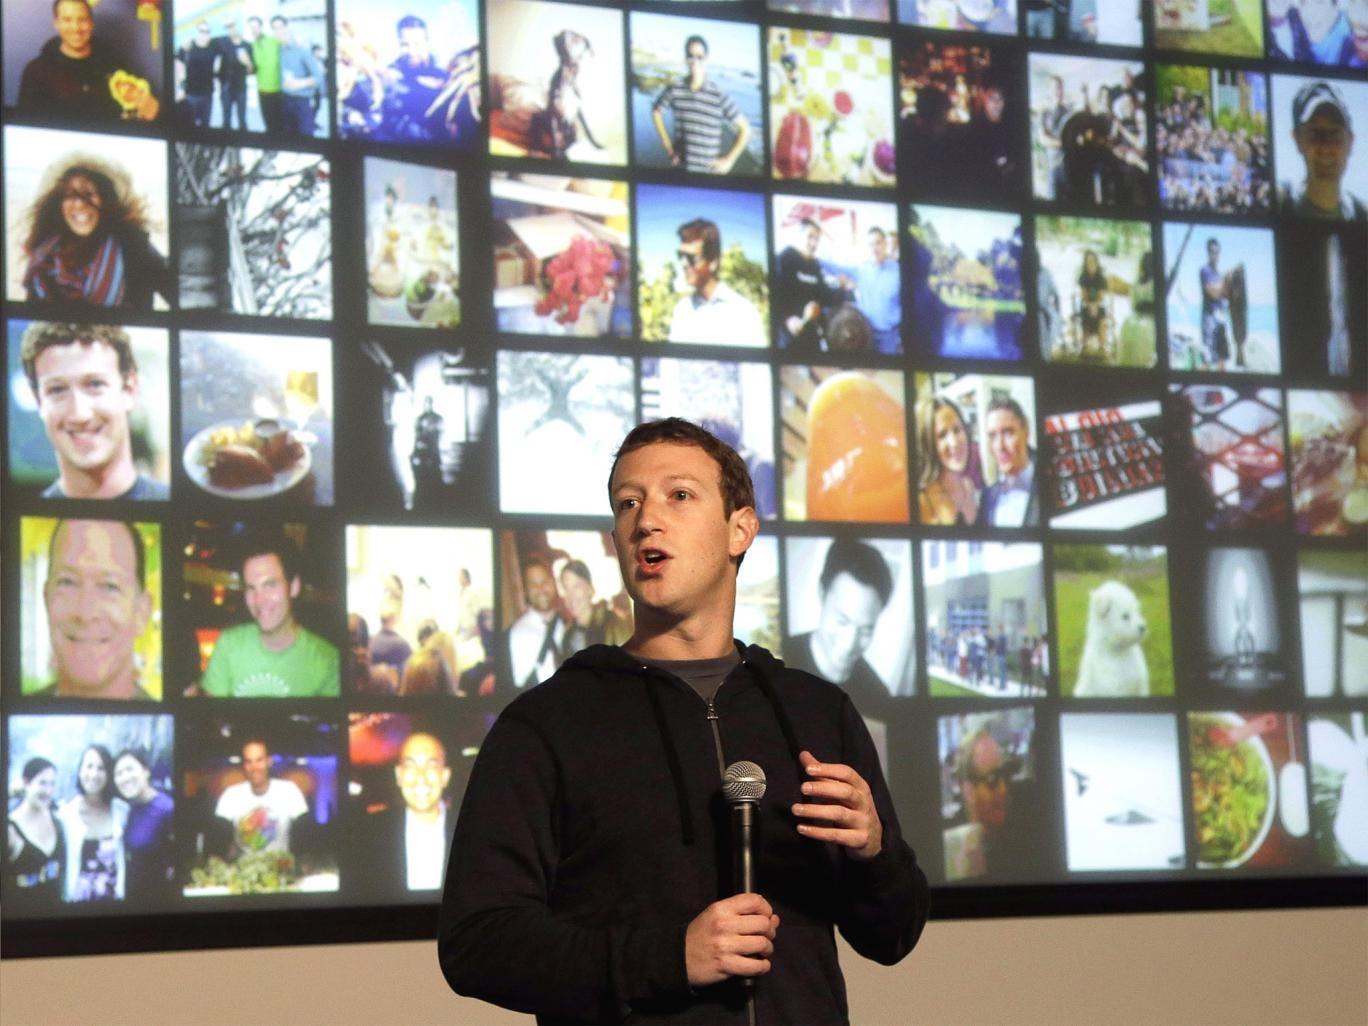 Mark Zuckerberg speaking at the Facebook headquarters in California